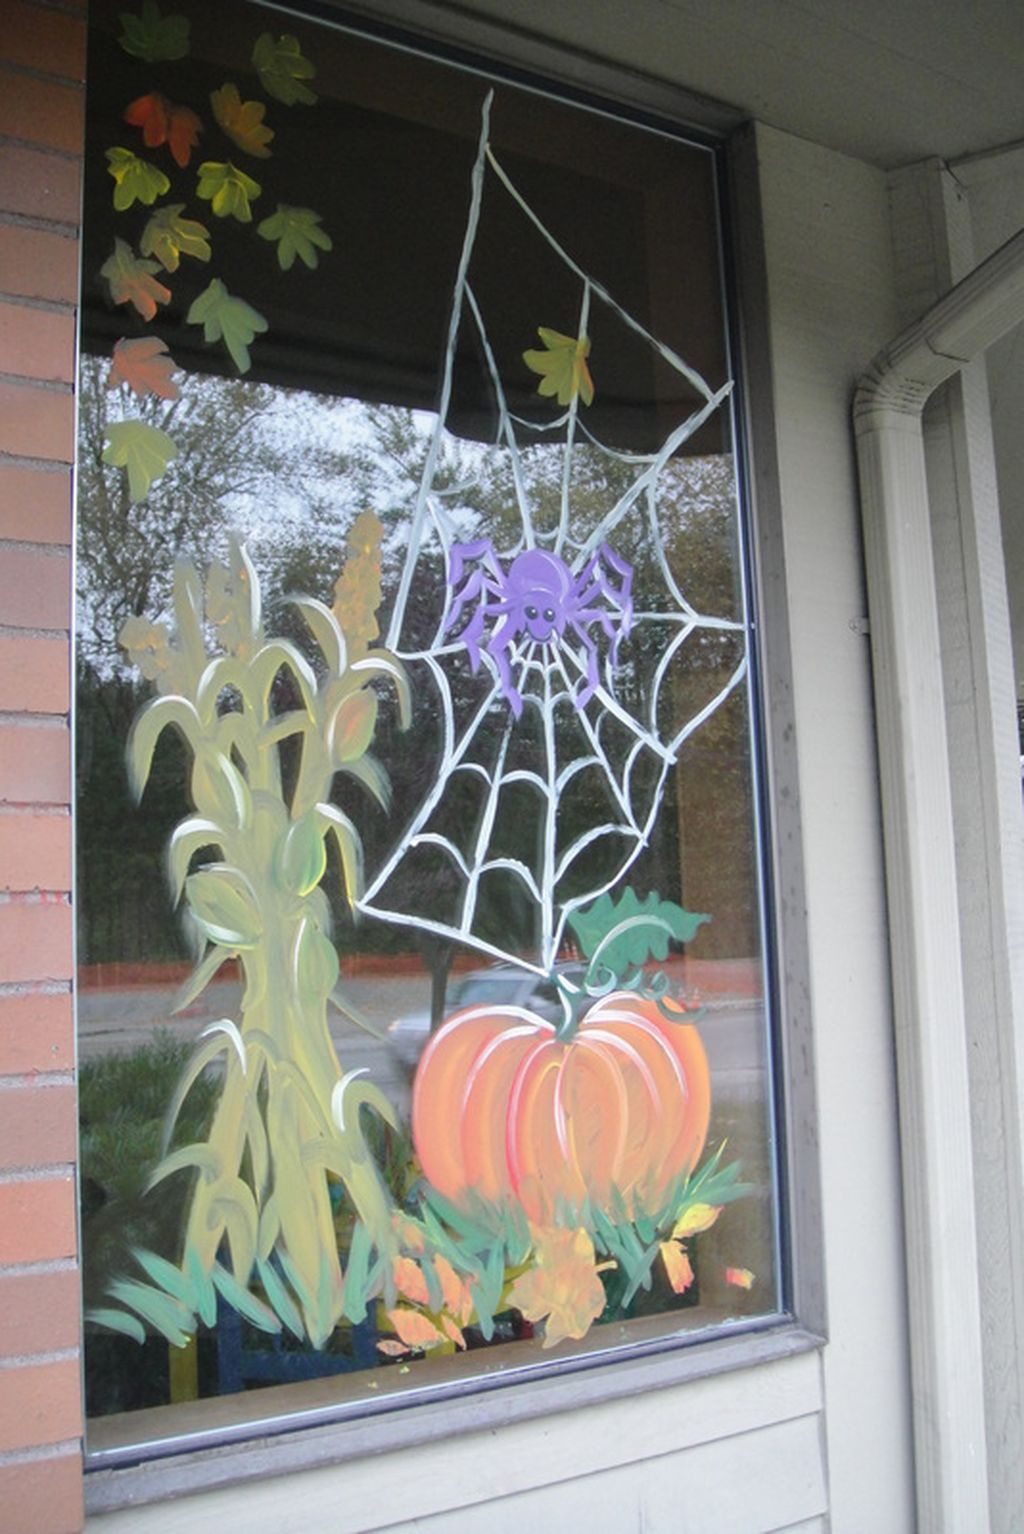 Scary But Creative Diy Halloween Window Decorations Ideas You Should Try 47 Homedecorish